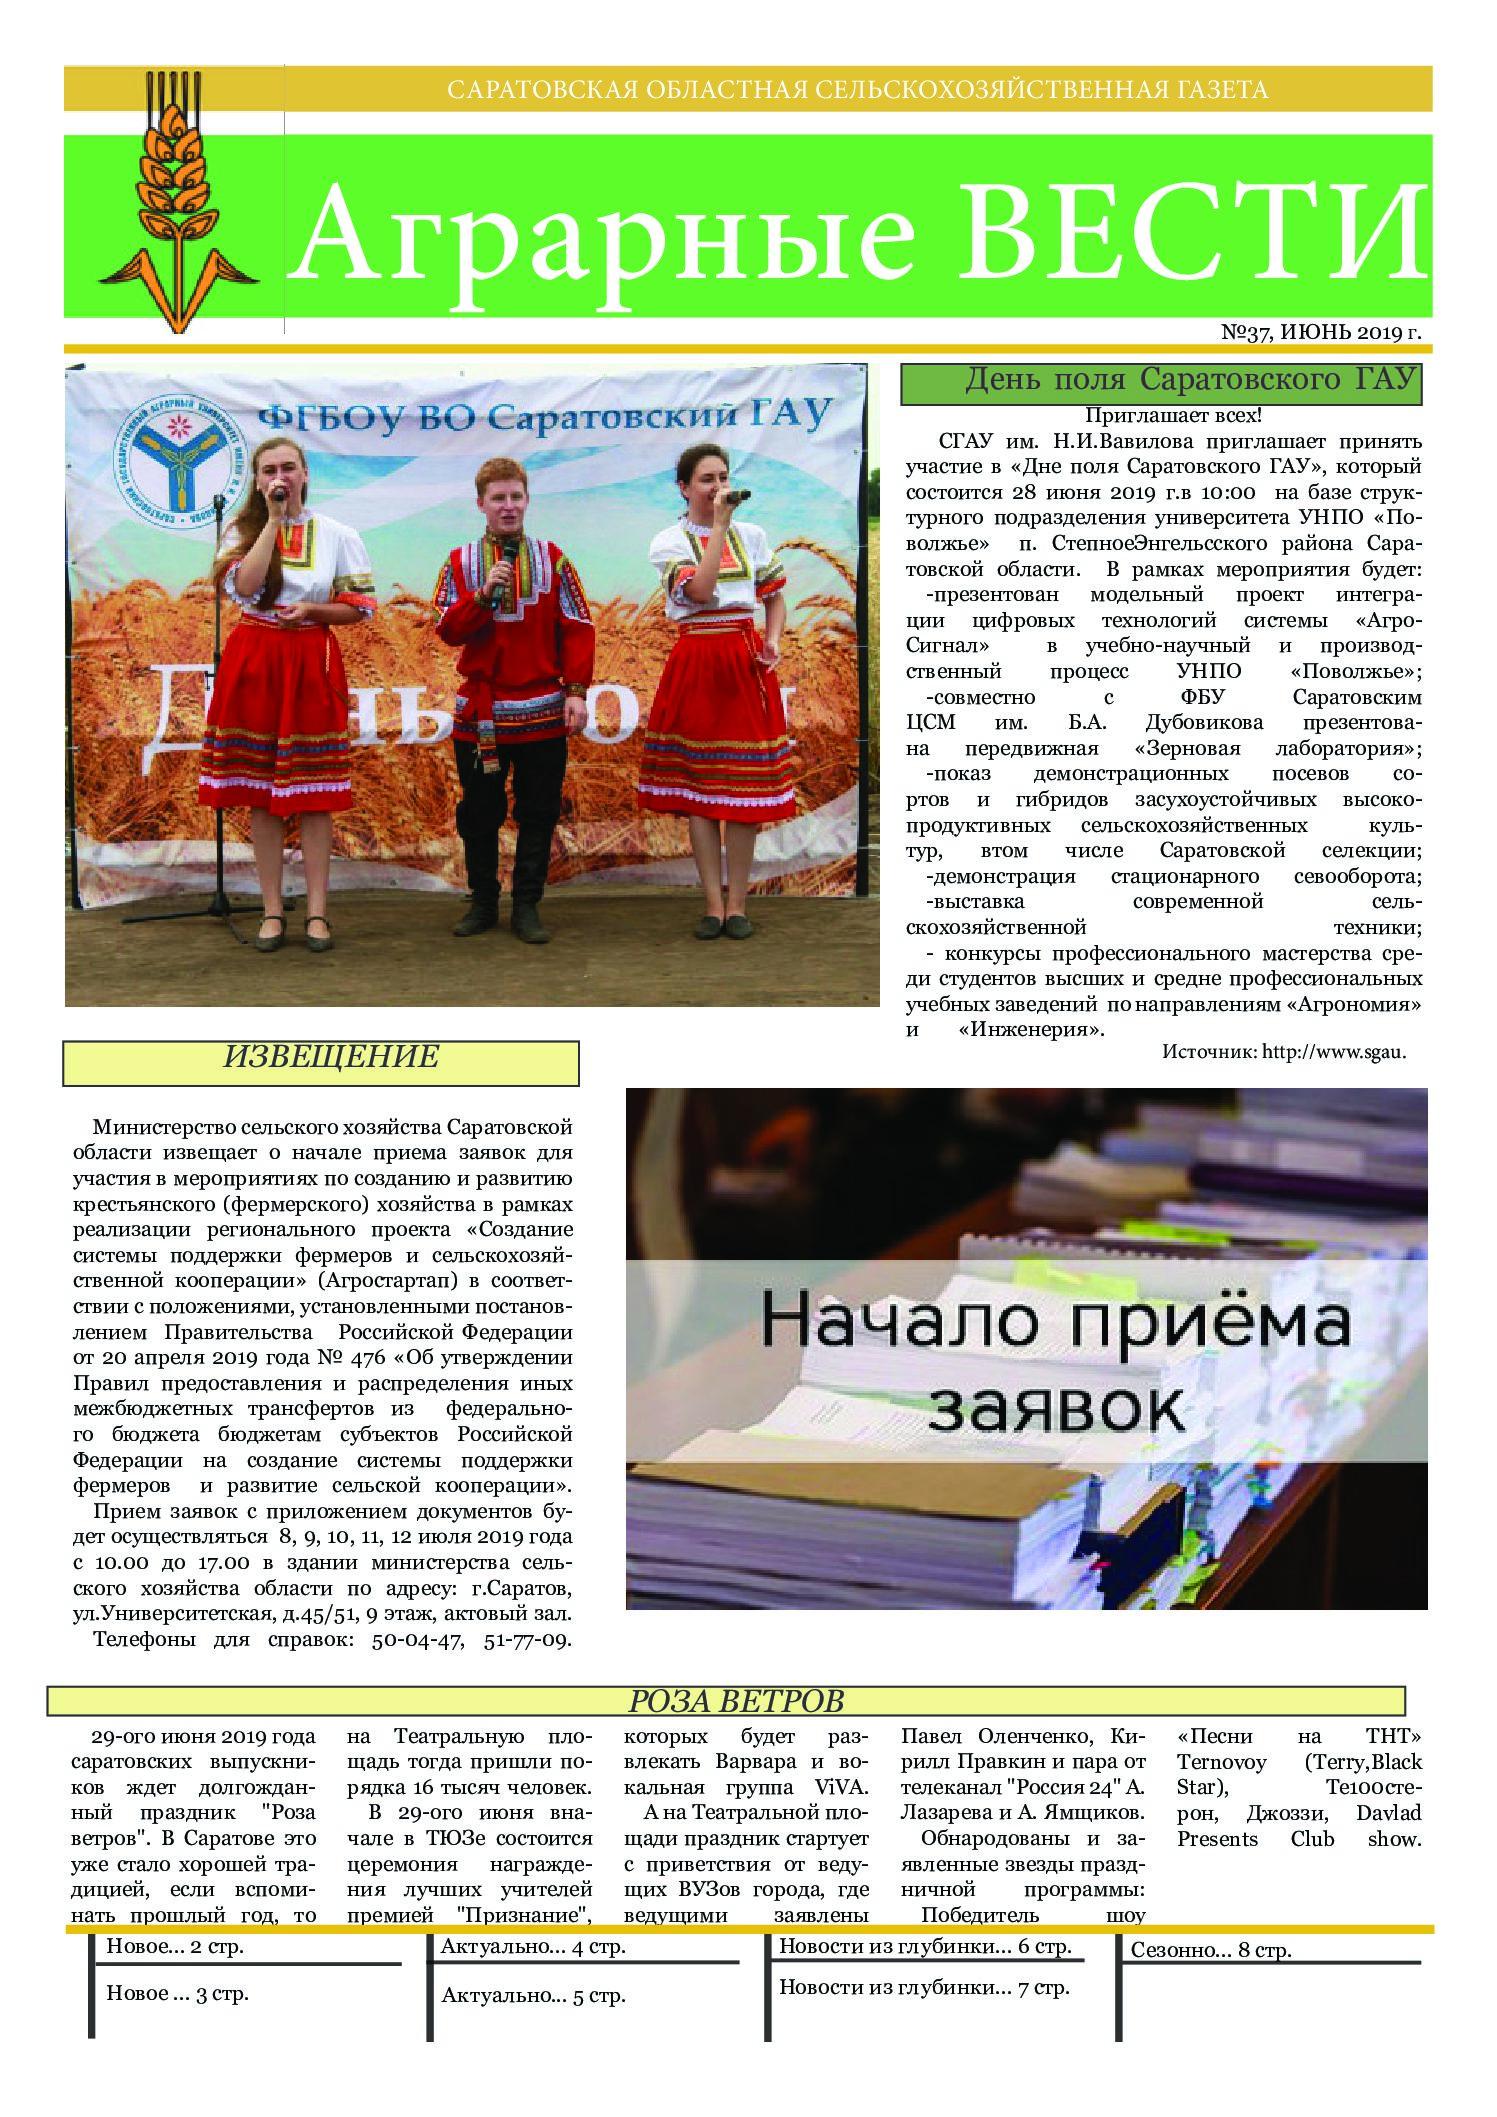 https://saratovagro.ru/wp-content/uploads/2020/08/Июнь-37-pdf.jpg